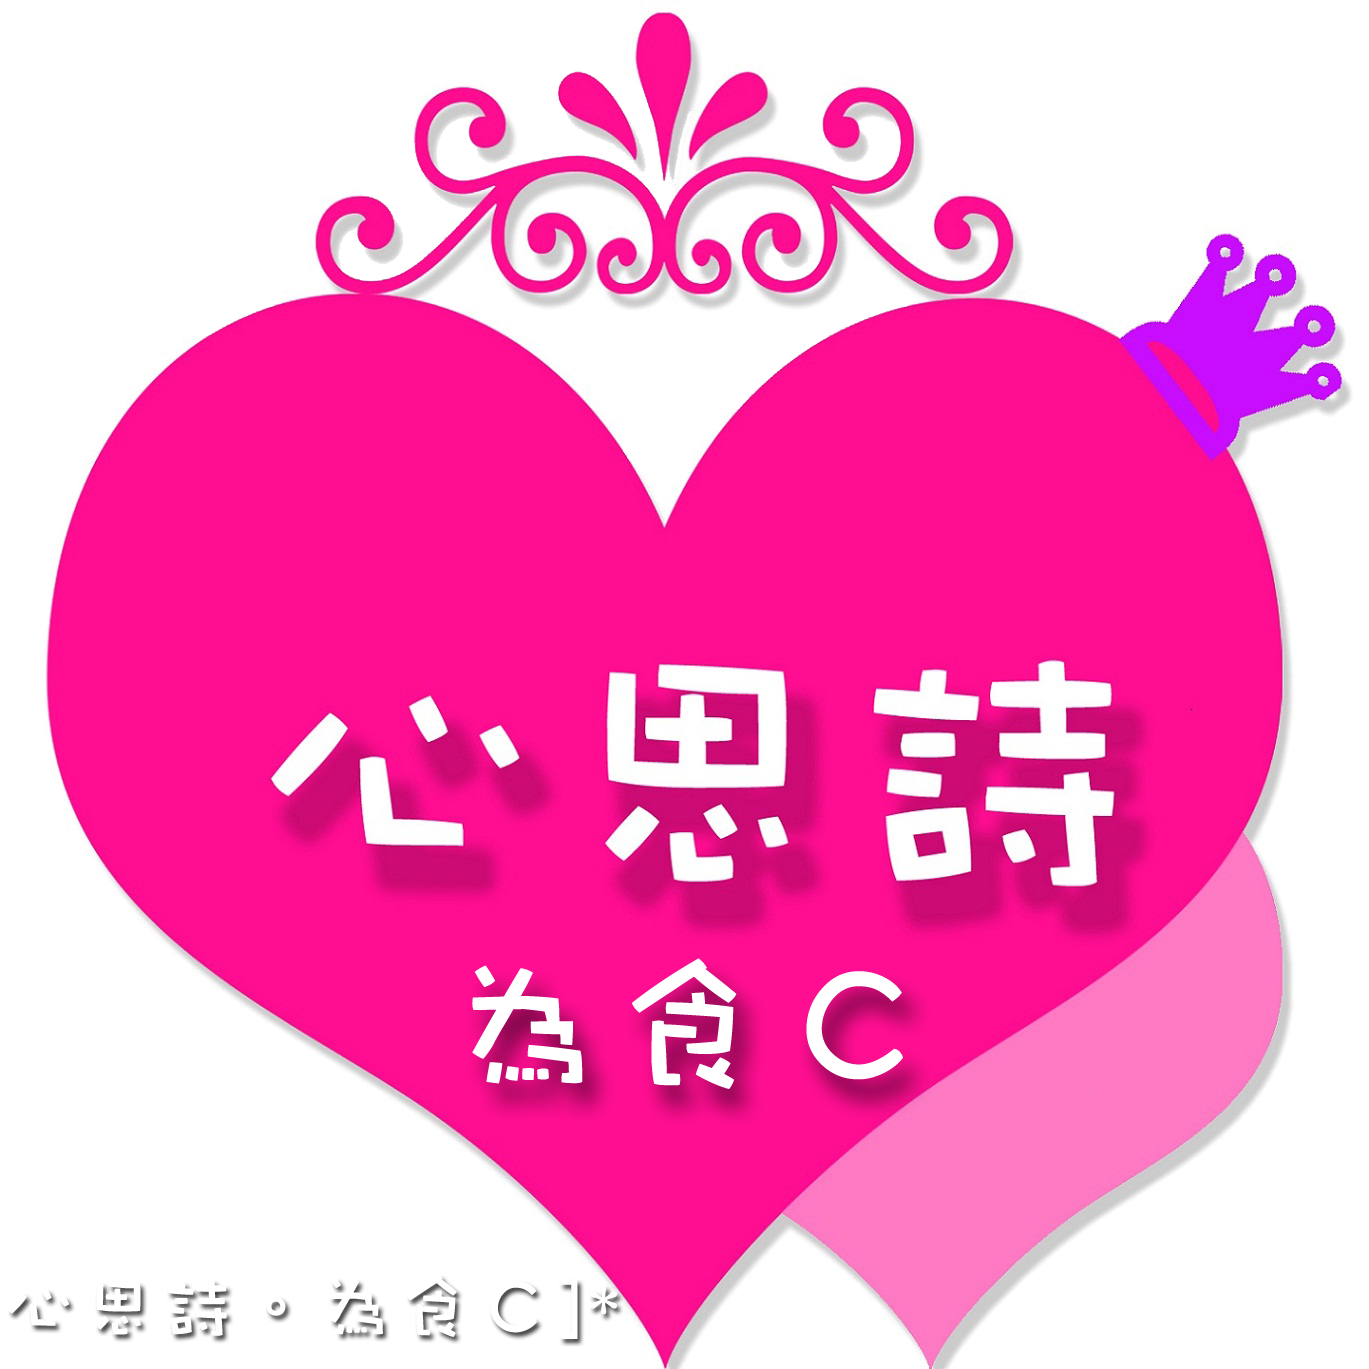 https://dl.dropbox.com/s/hj71oqa2ou7k4bt/logo2.png